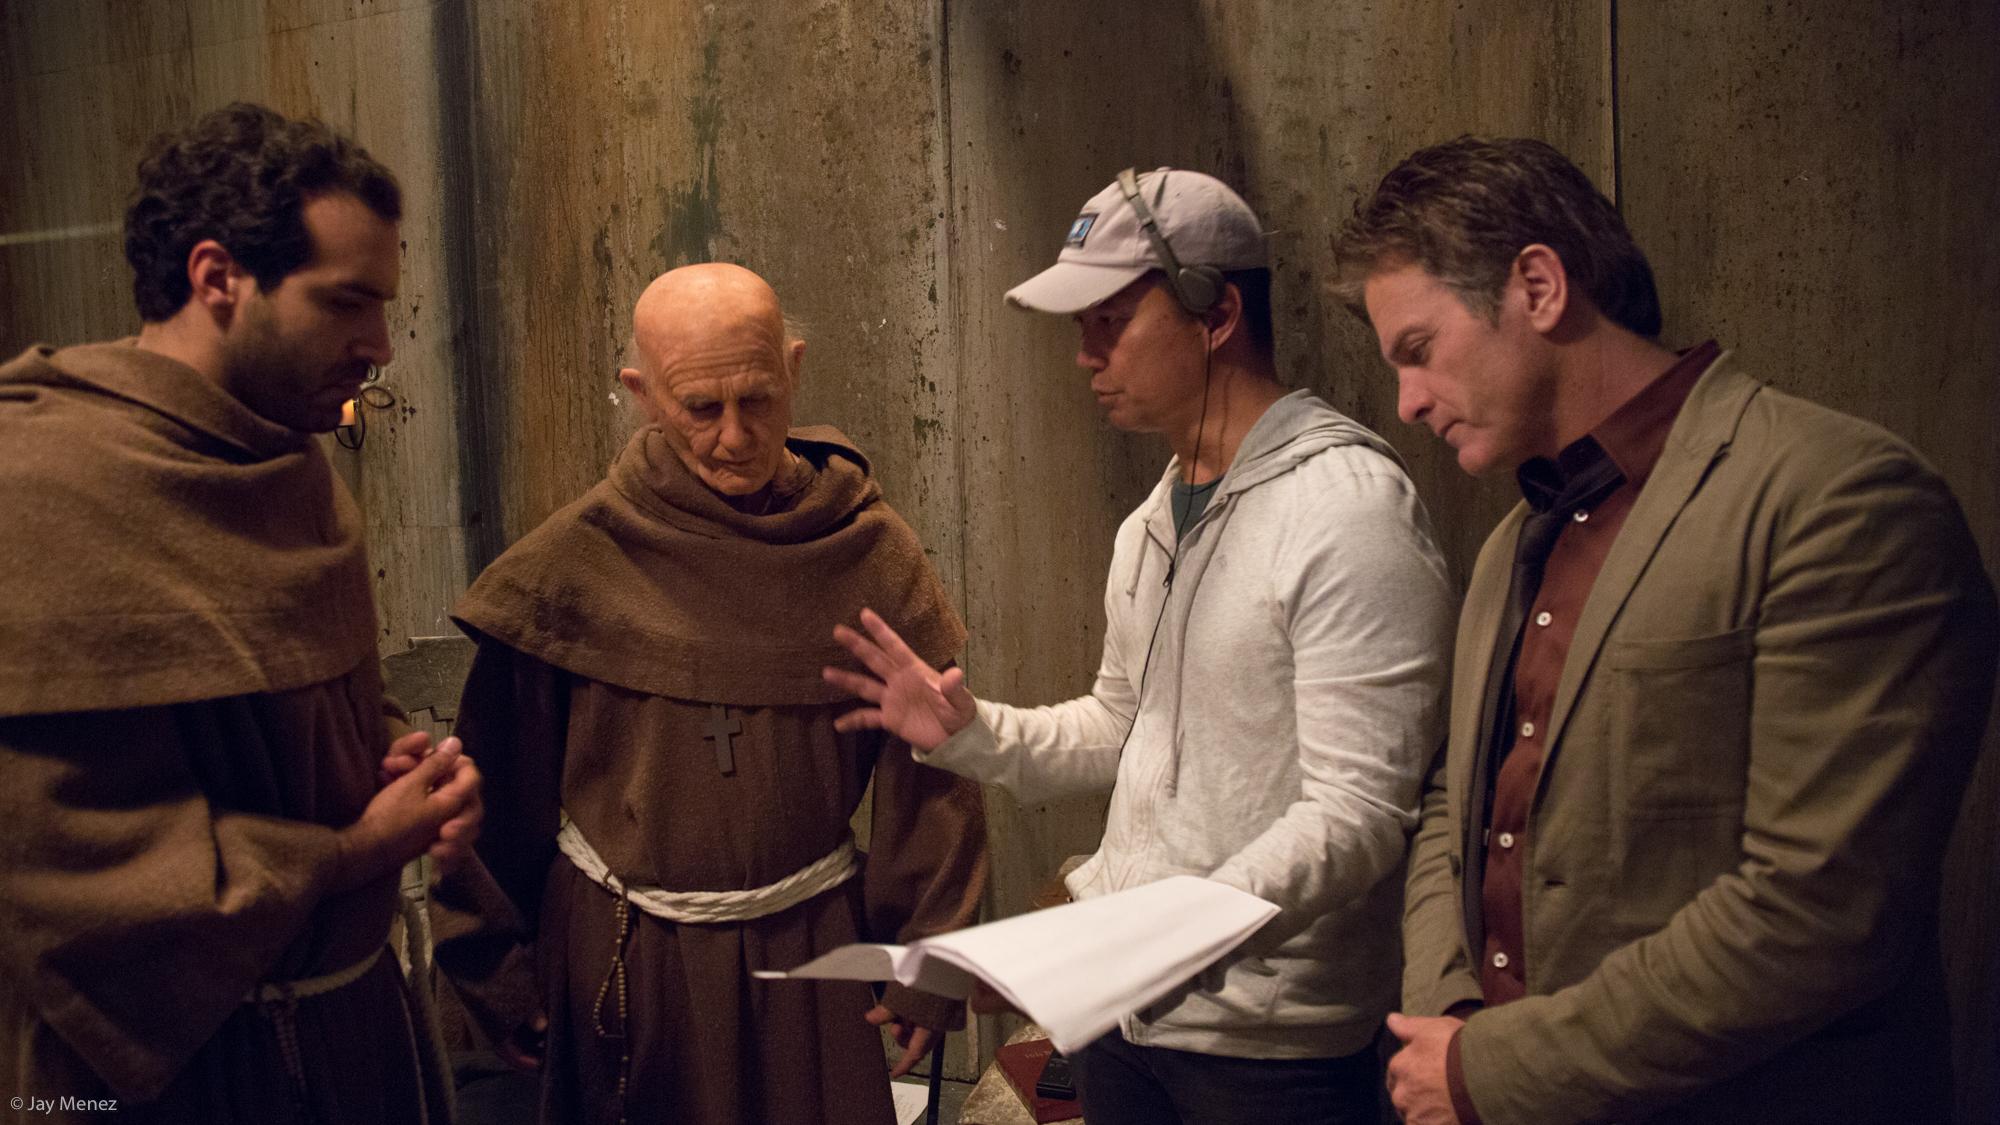 Sanctuary (2016) Actors Alain Washnevsky, Sava Markovic, Jon Briddell and Director Jay Menez